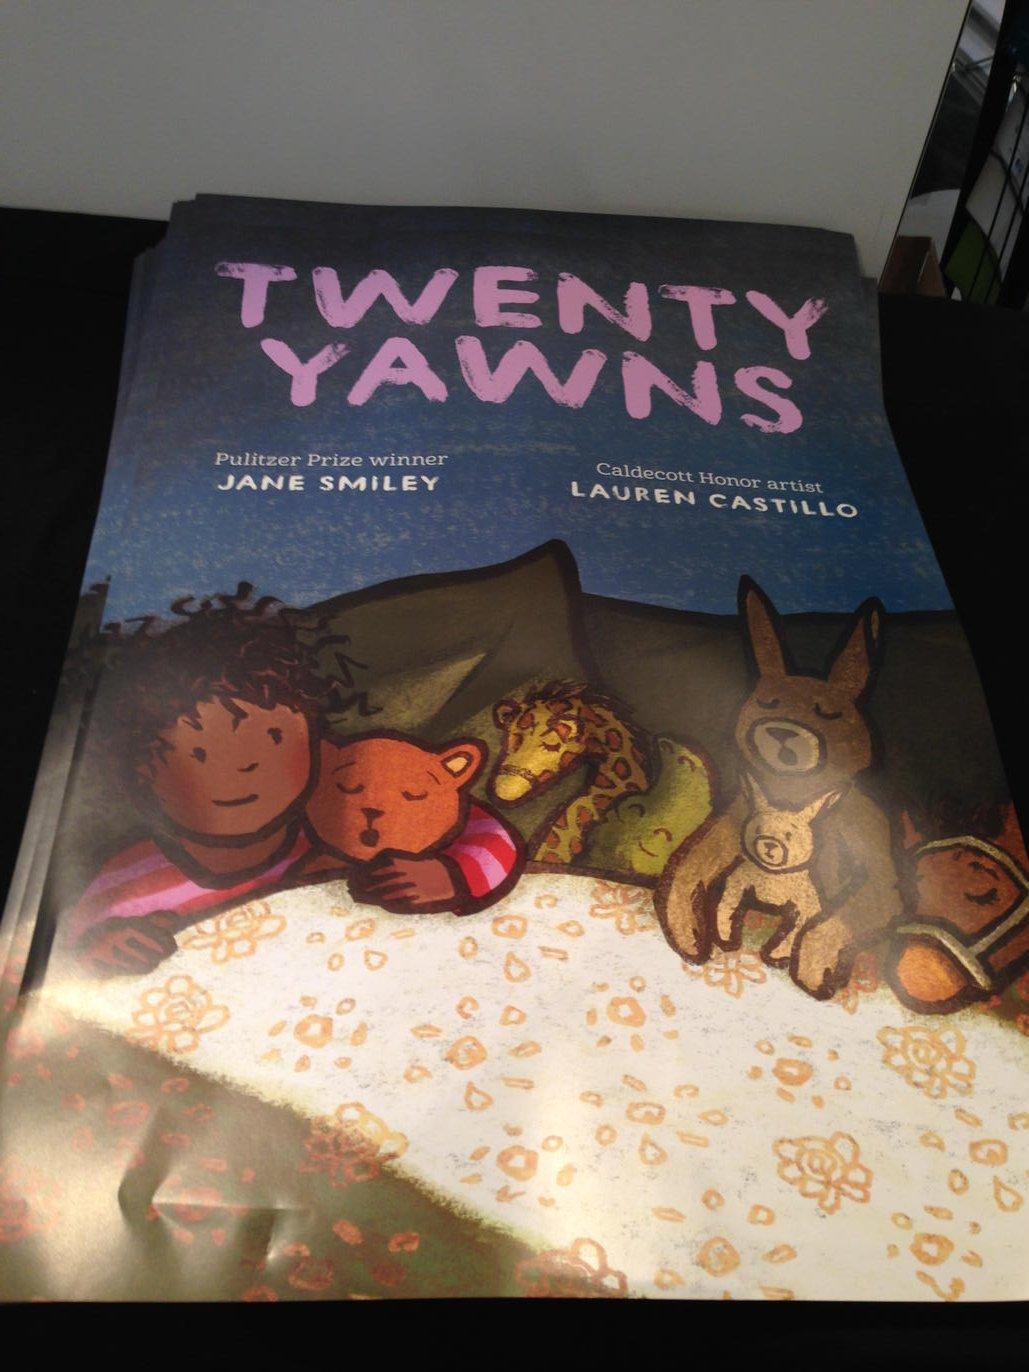 TWENTY YAWNS by Jane Smiley @studiocastillo POSTER & F&Gs signed by Lauren @bakerandtaylor booth #1331 #alamw16 10AM https://t.co/KkF7S03cFk